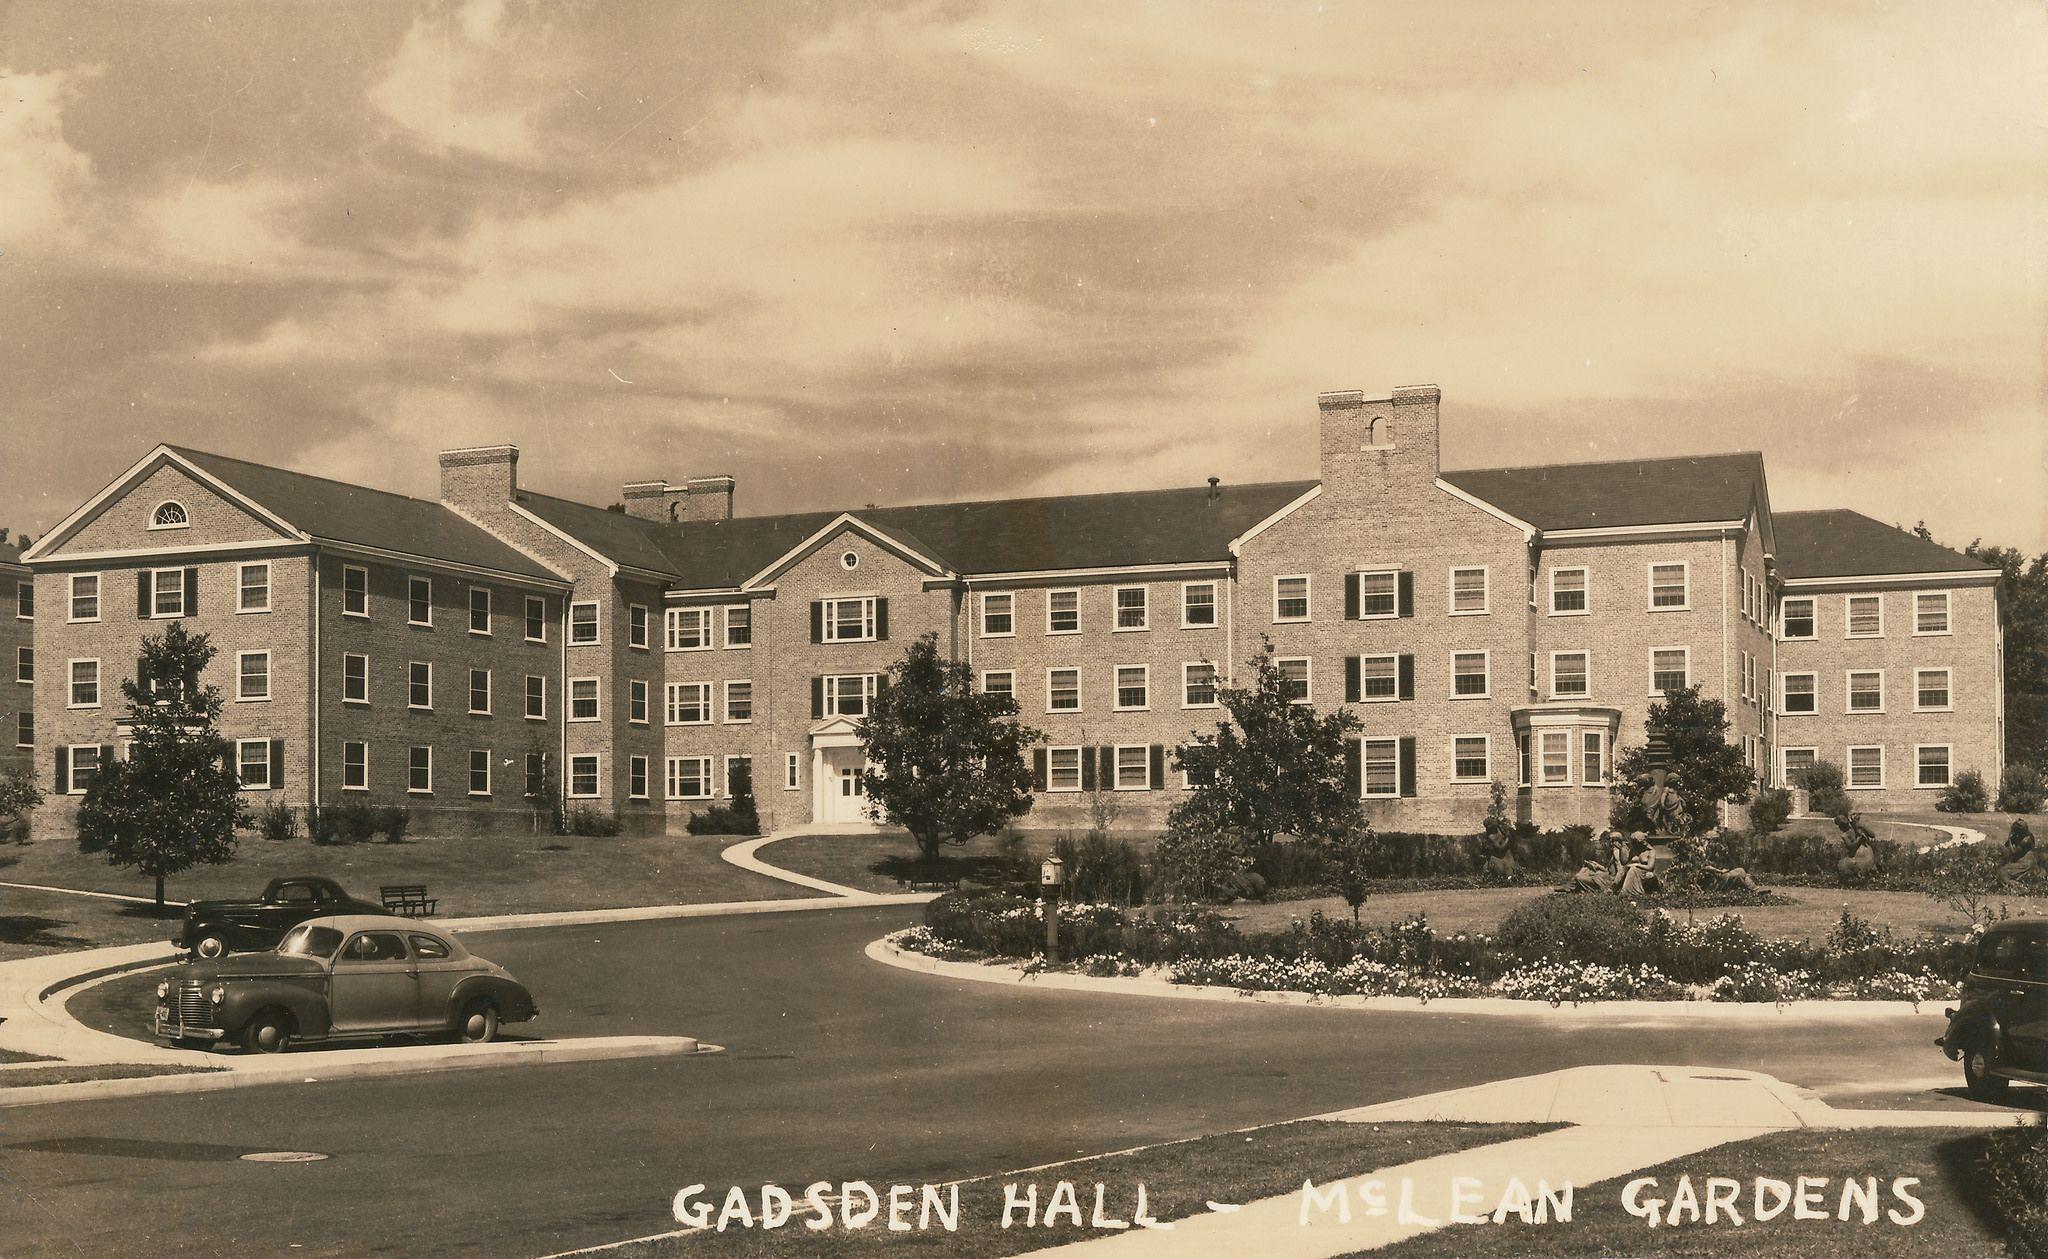 McLean Gardens (c. 1950) | Historic Washington DC postcards ...